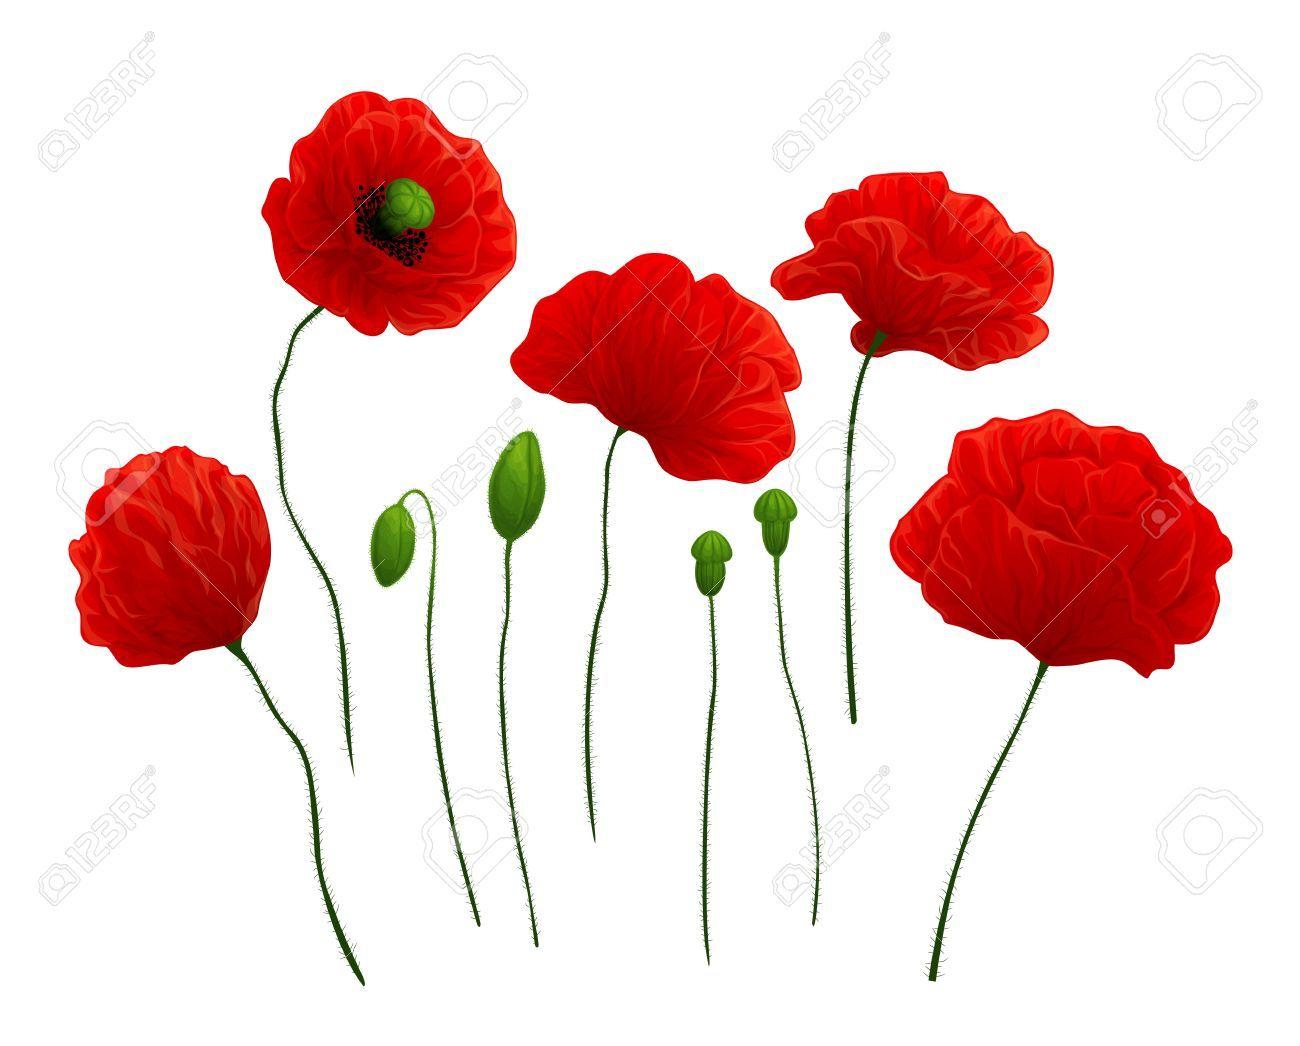 Stock Photo Red Poppies Free Art Prints Poppies